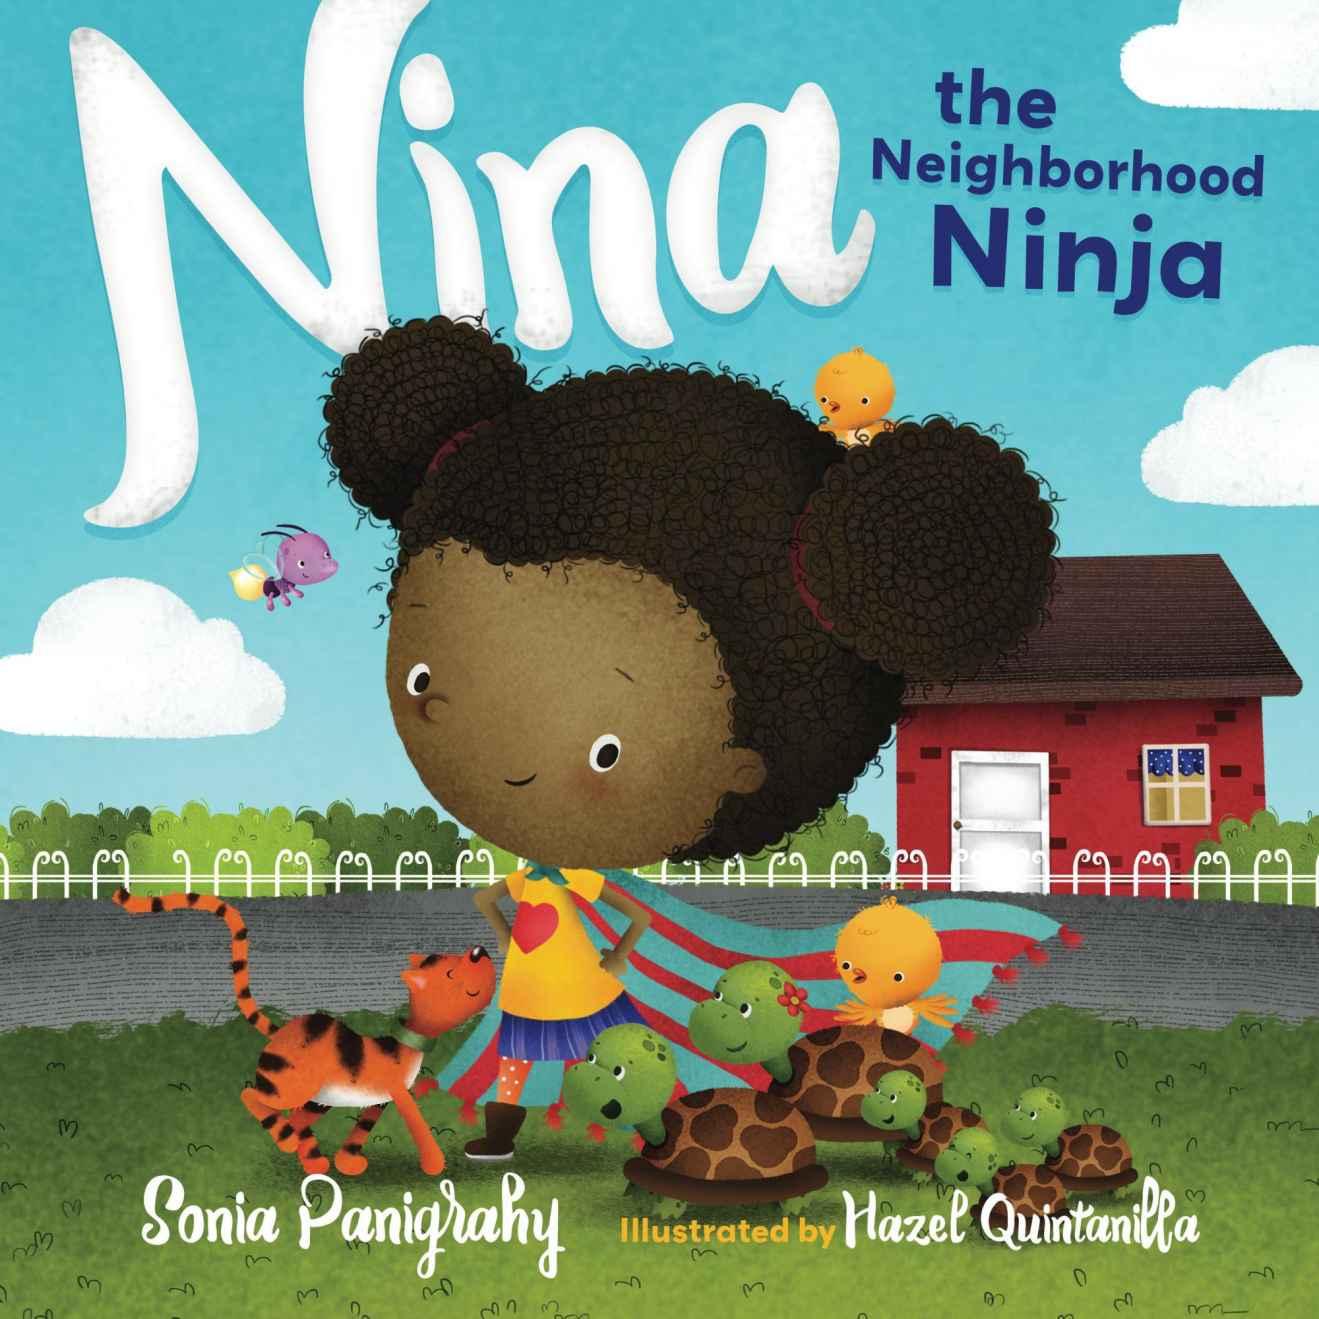 Nina the Neighborhood Ninja by Sonia Panigrpahy